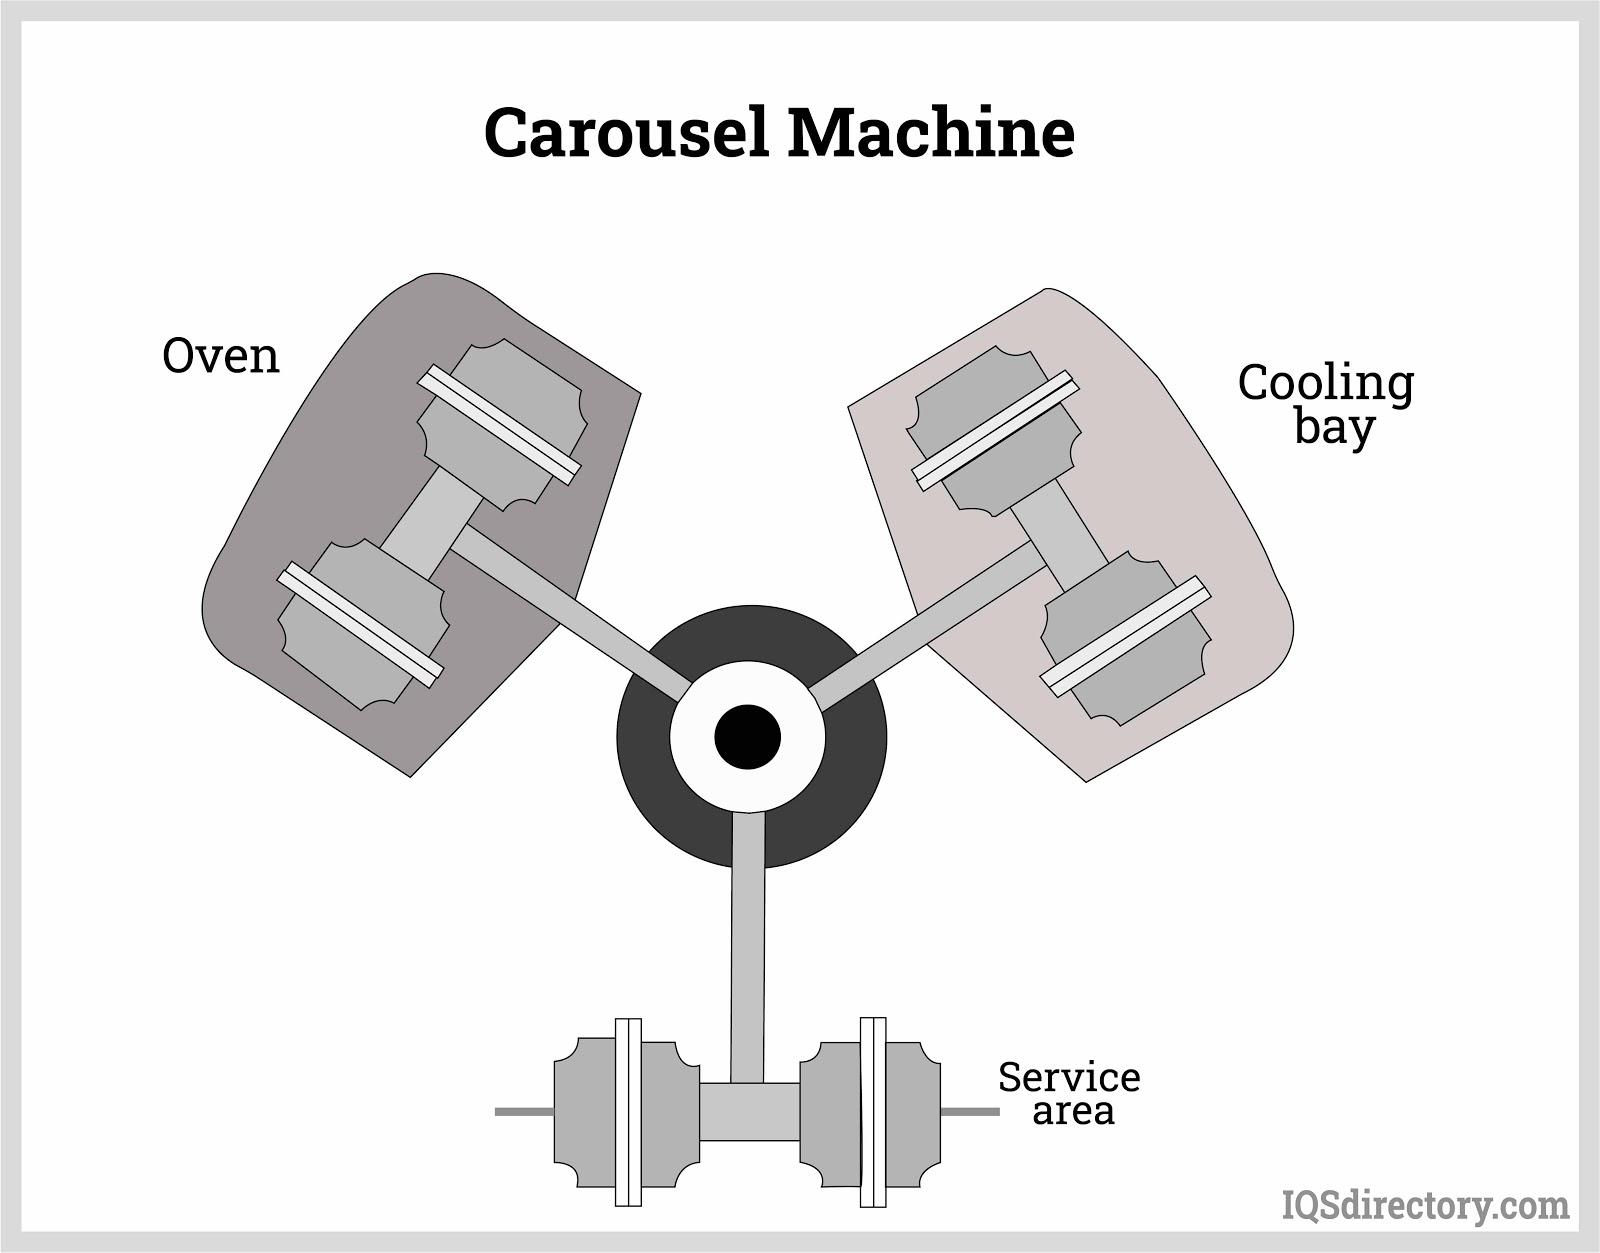 Carousel Machine